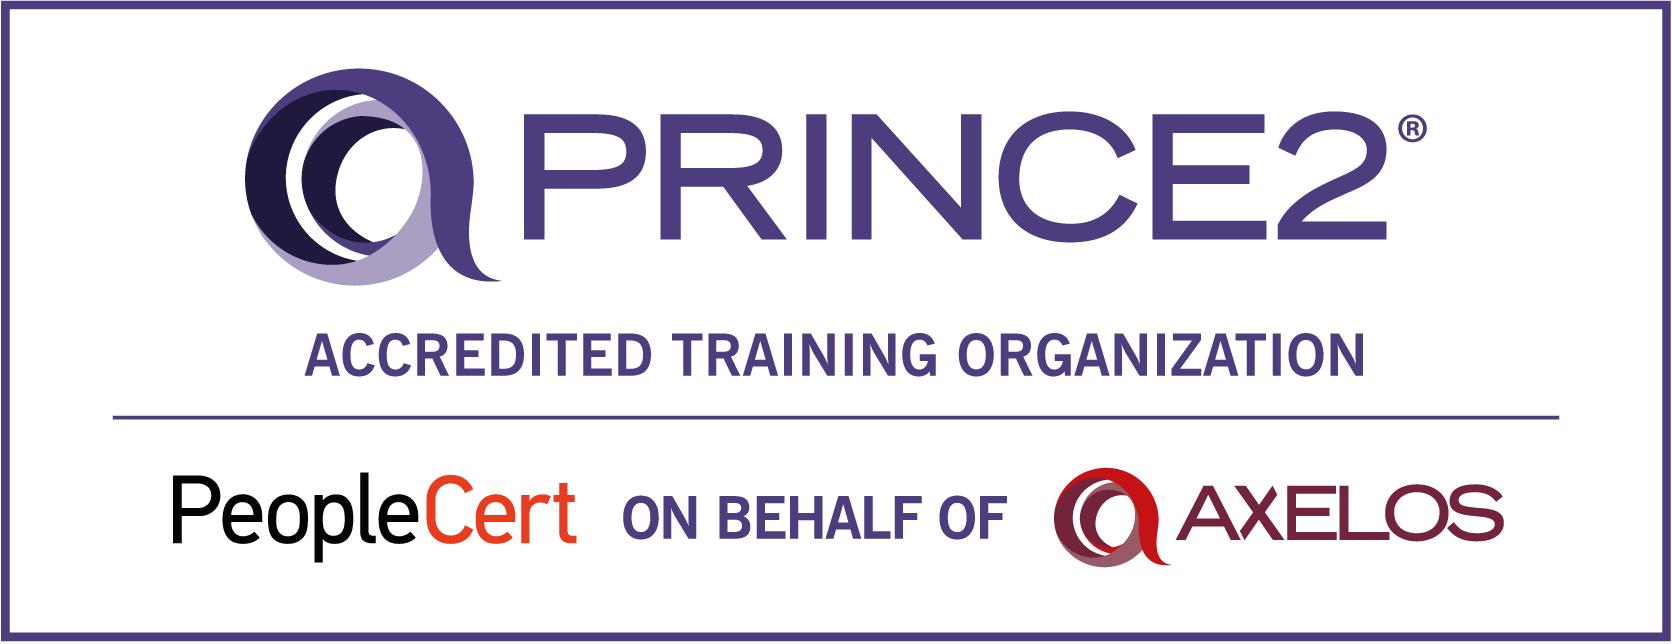 prince2 projektmanagement